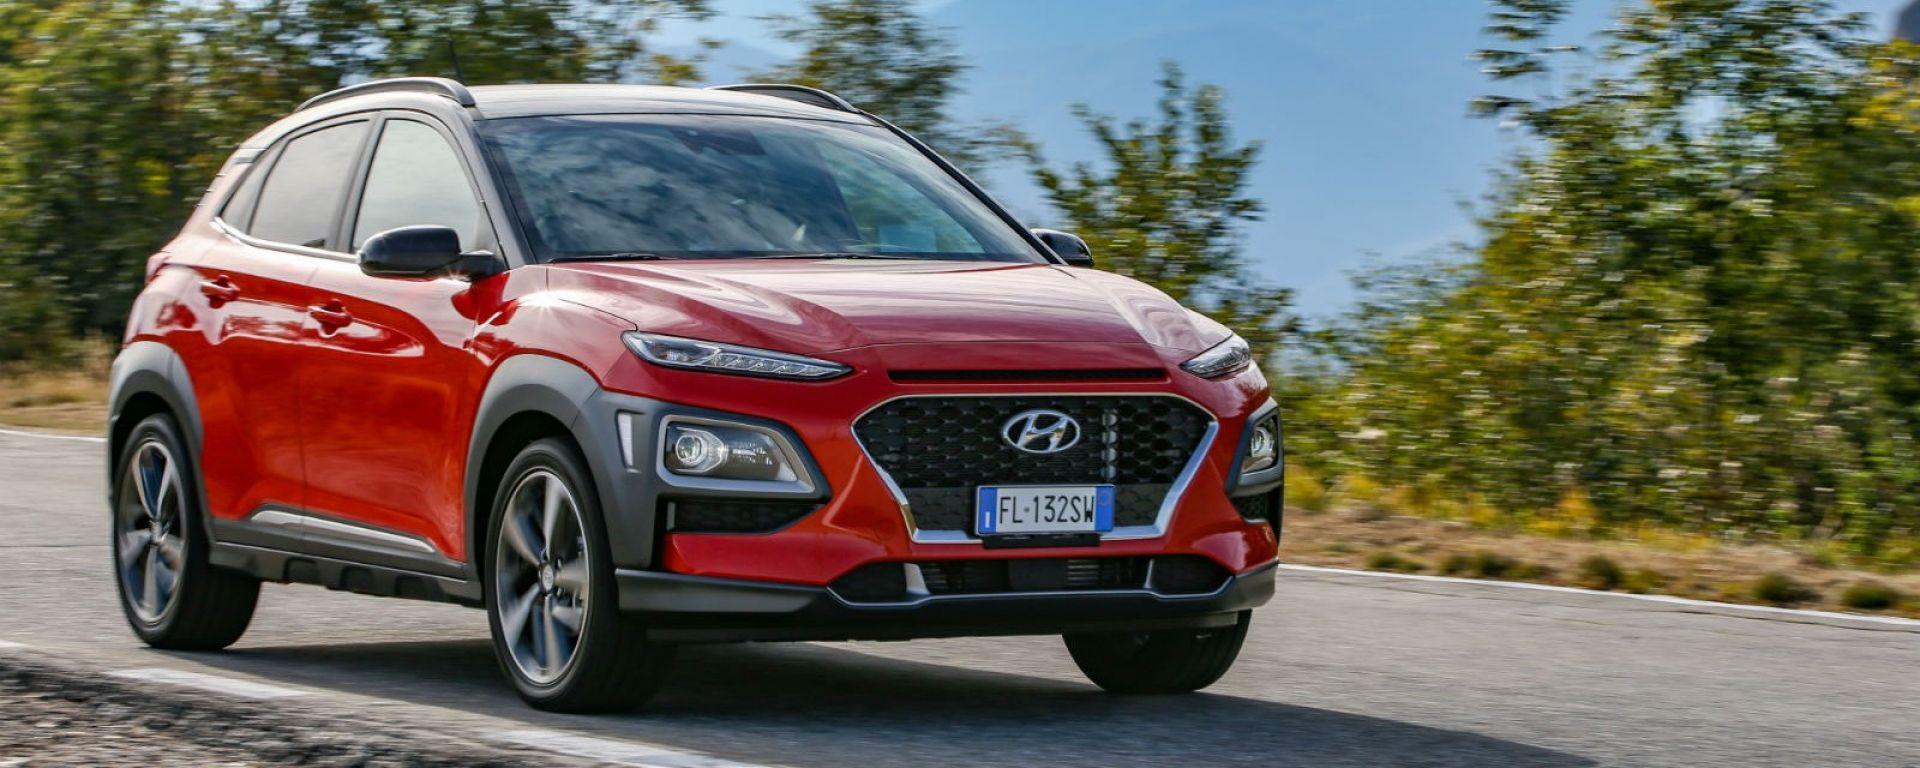 Hyundai Kona - 5 stelle Euro NCAP